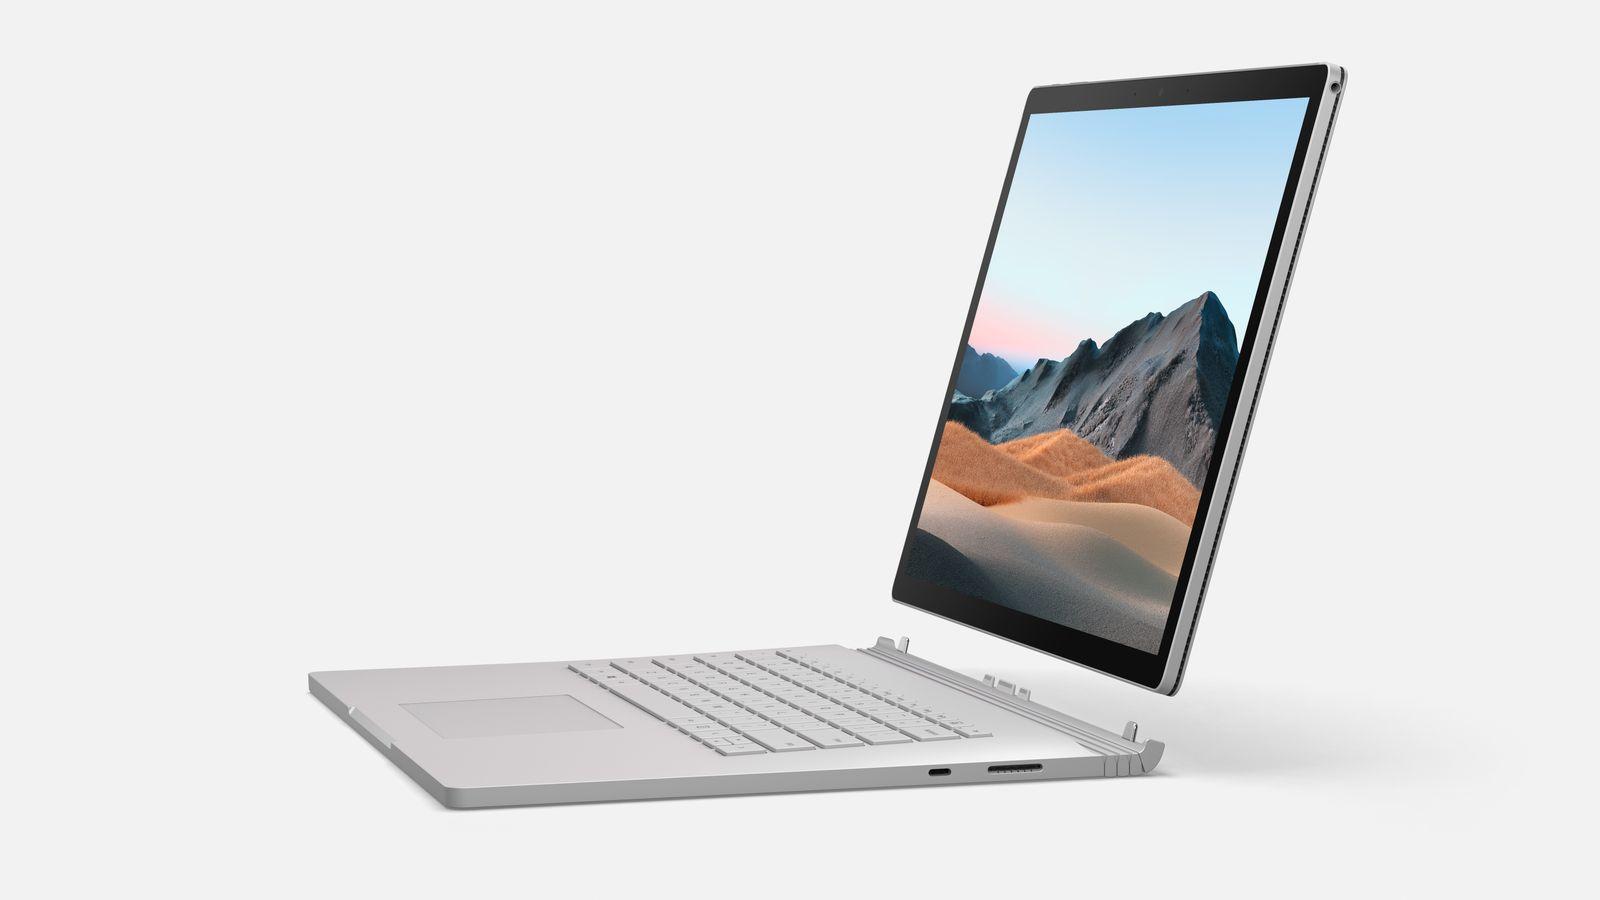 Surface Book 3 - Render 4 / SPERRFRIST 6.5. 15 Uhr